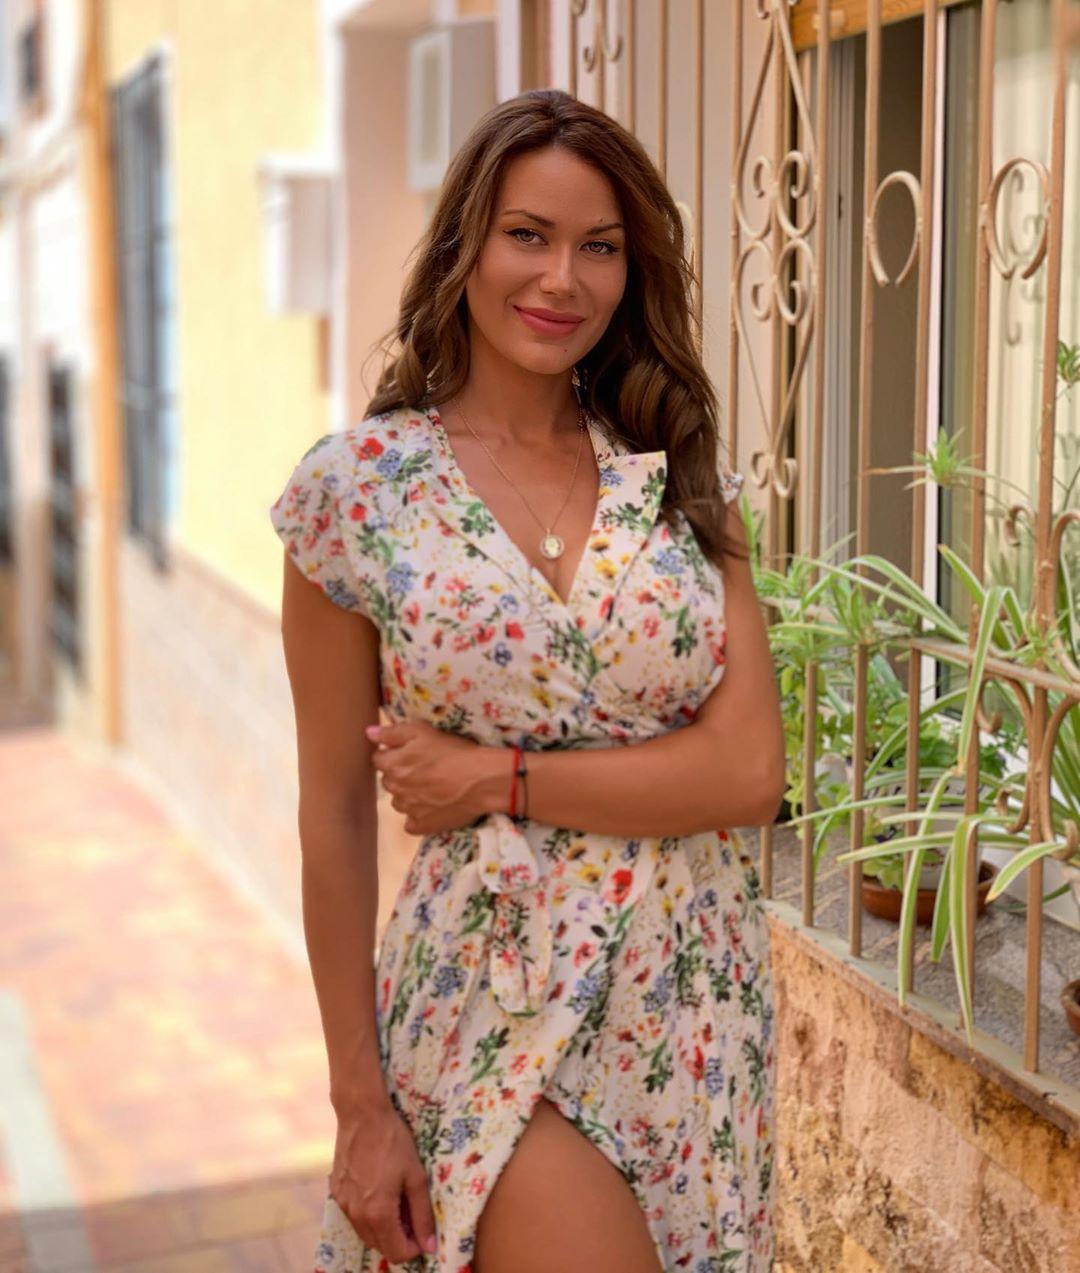 Tania-Barbara-Wallpapers-Insta-Fit-Bio-1